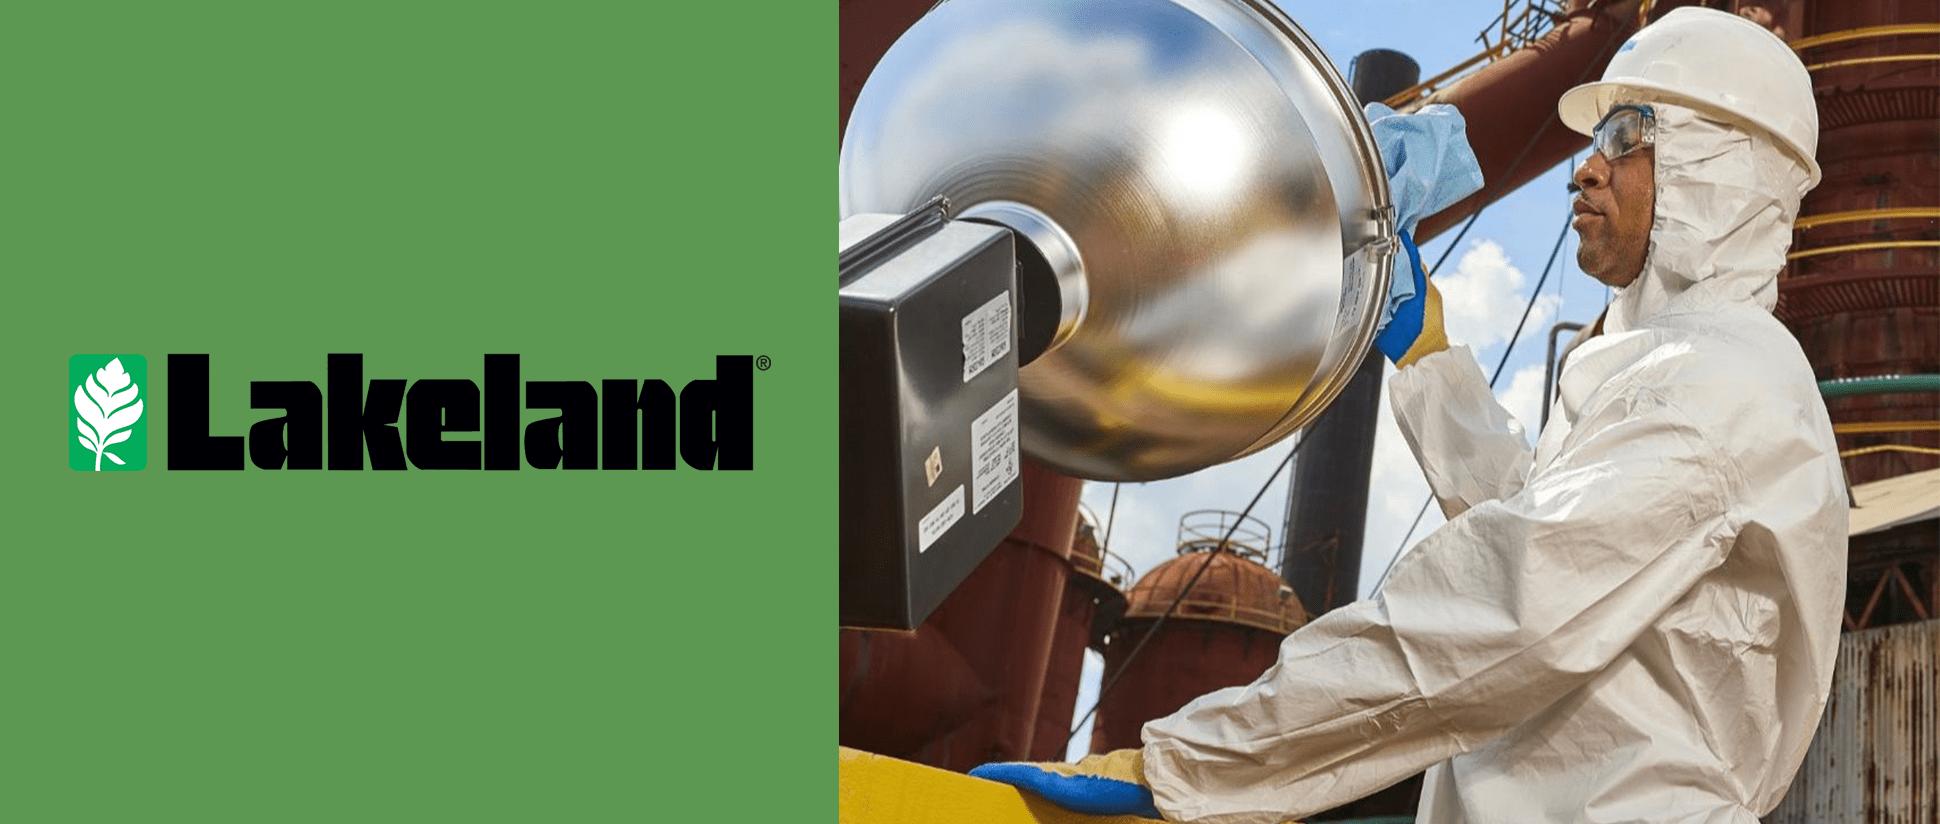 Lakeland Webinar Header Image